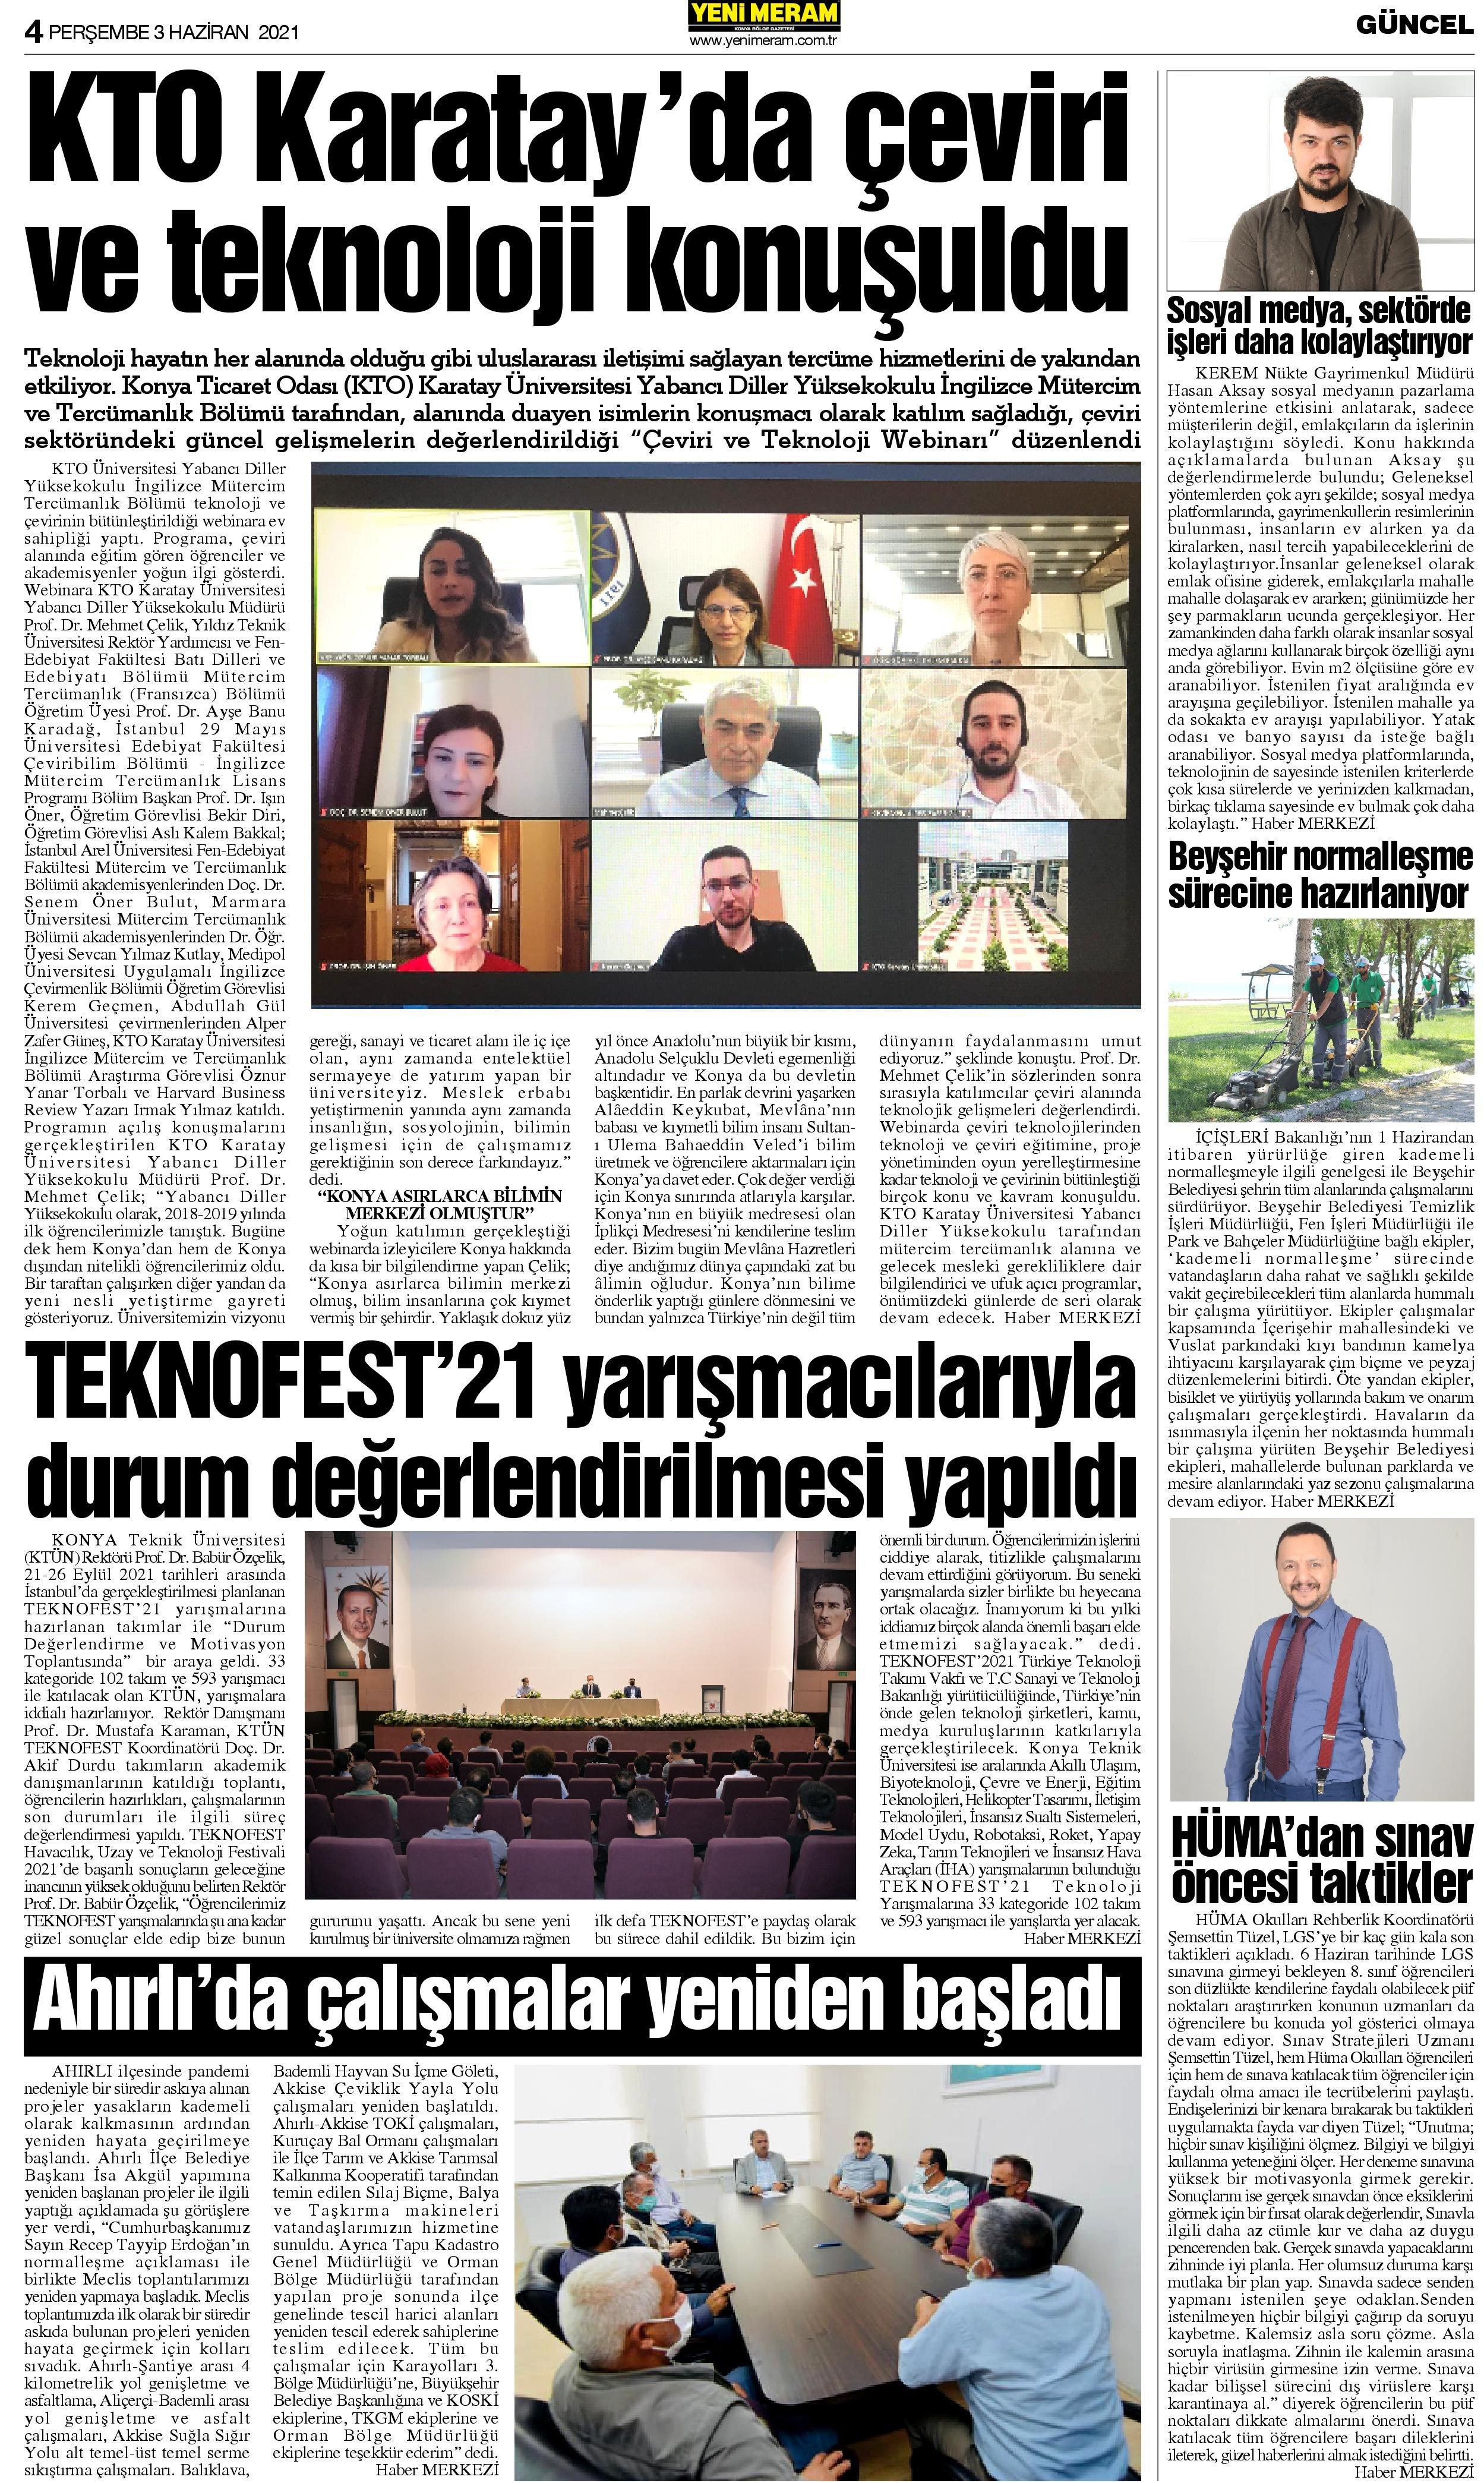 3 Haziran 2021 Yeni Meram Gazetesi